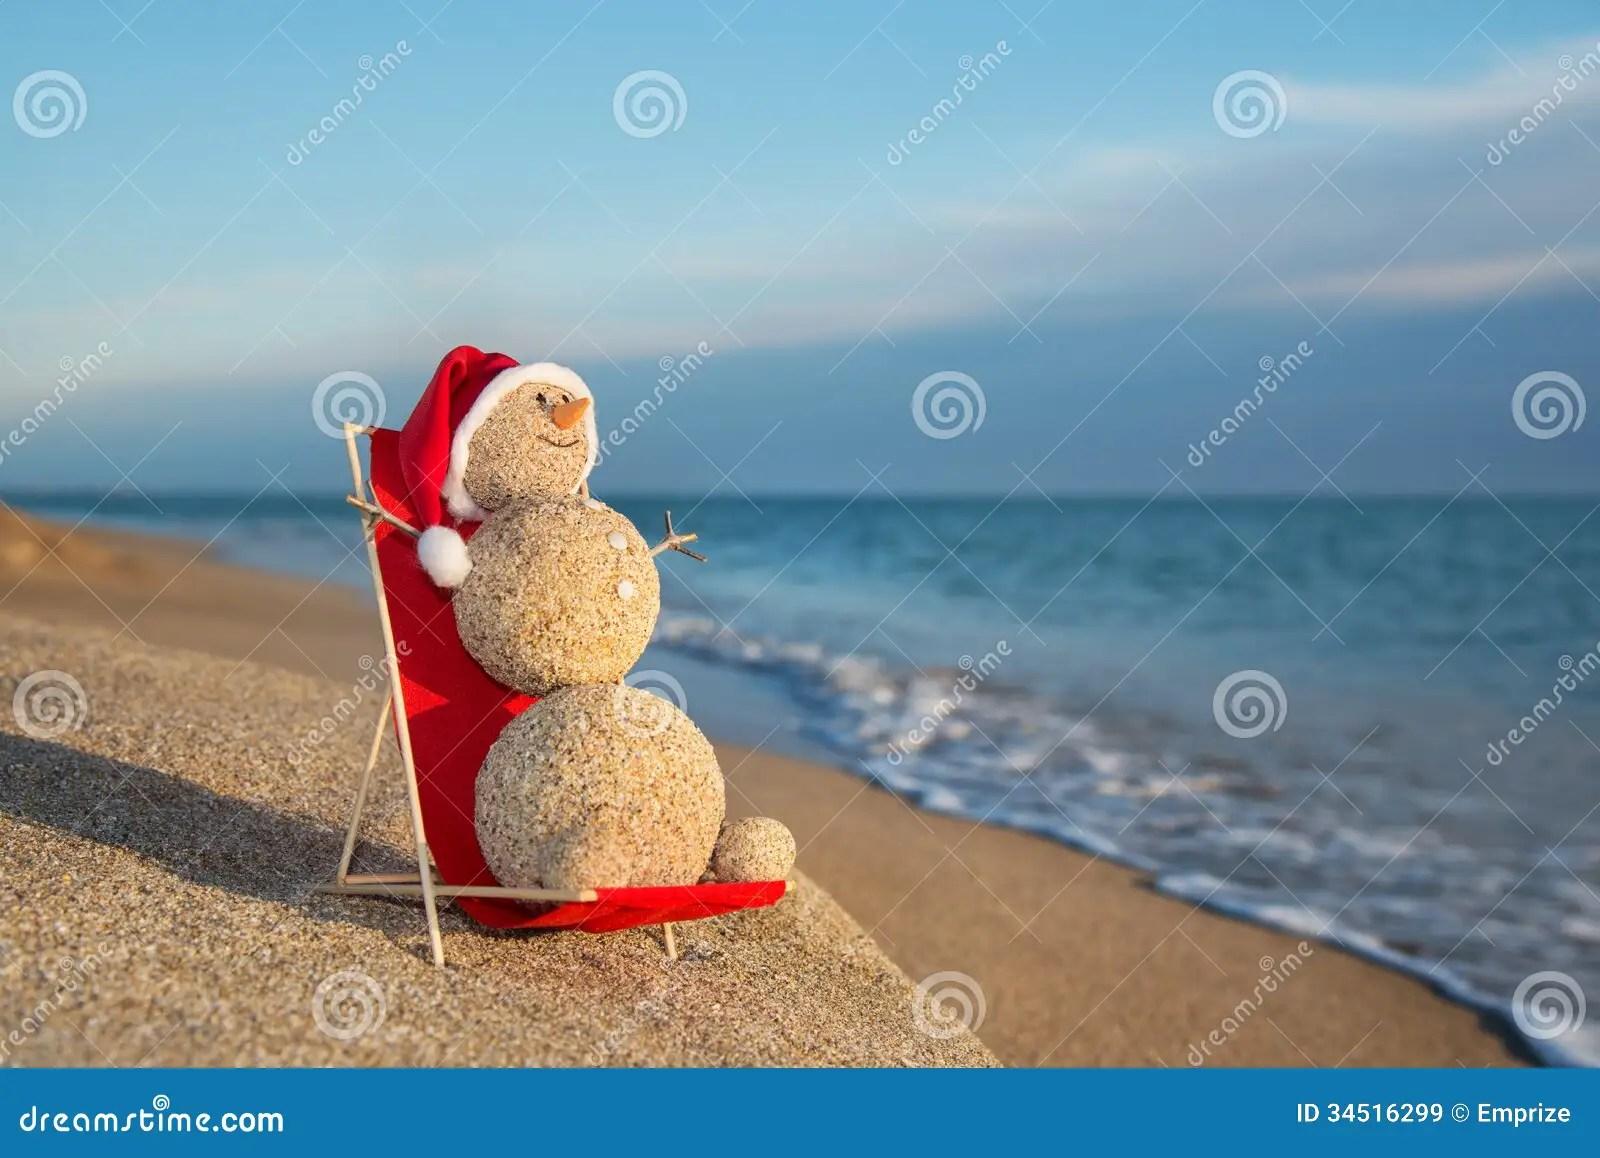 Sandy Snowman Sunbathing In Beach Lounge Holiday Concept